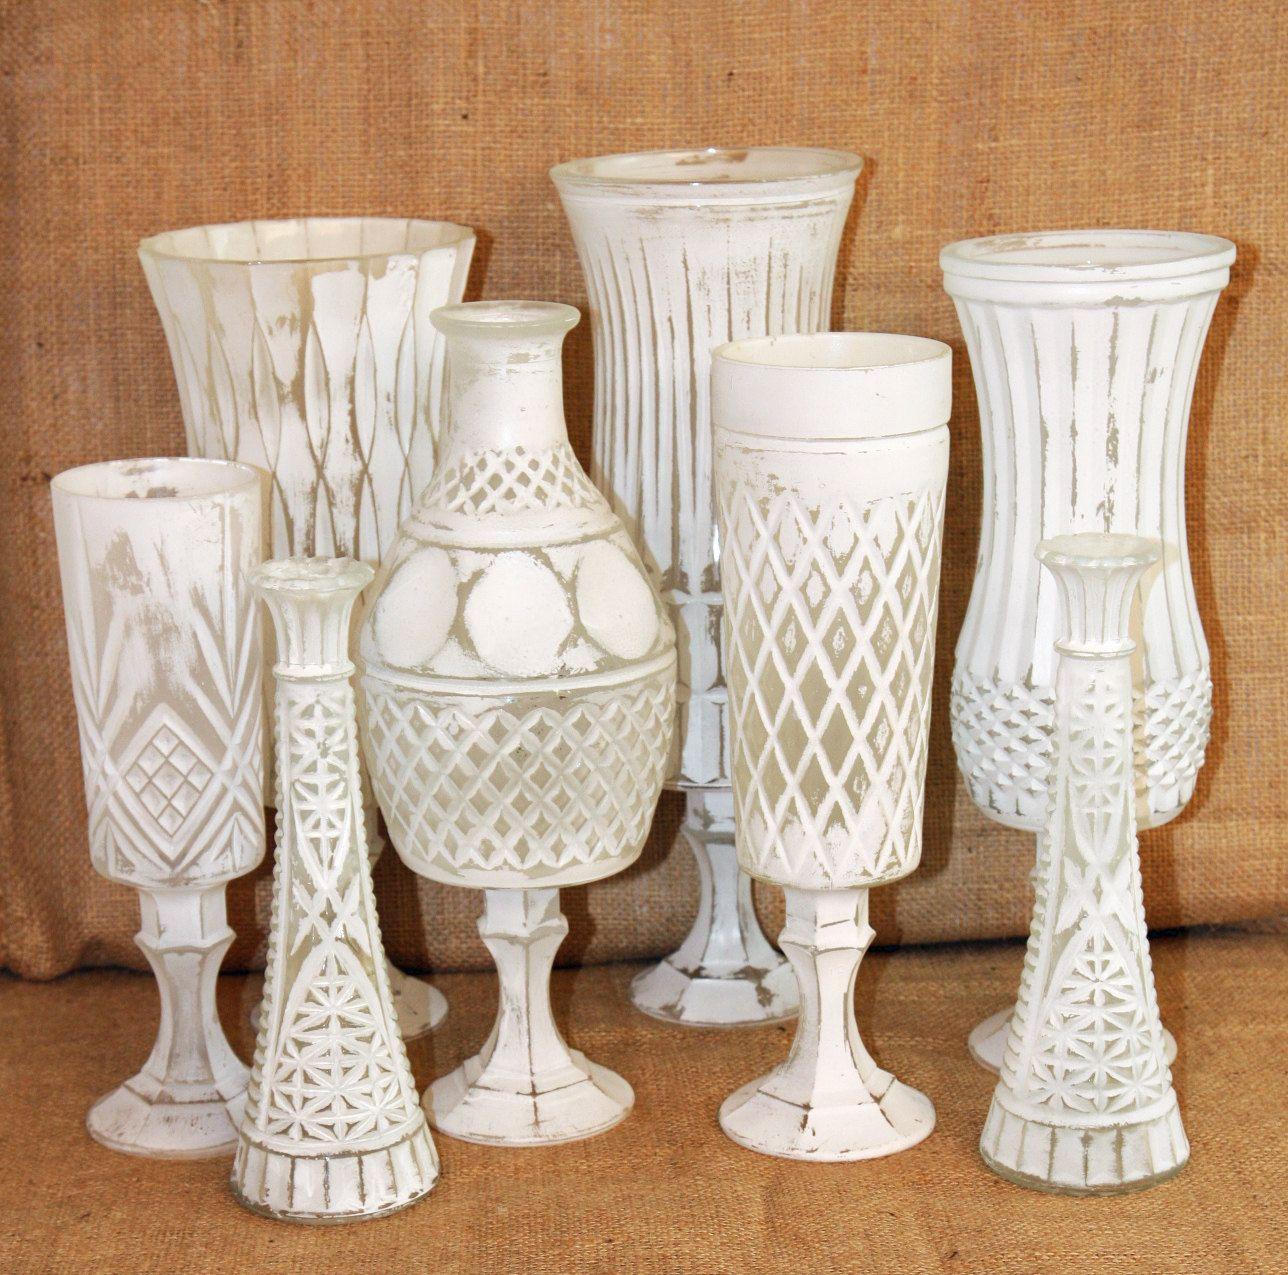 Shabby chic vintage white pedestal vases crafts pinterest shabby chic vintage white pedestal vases floridaeventfo Choice Image